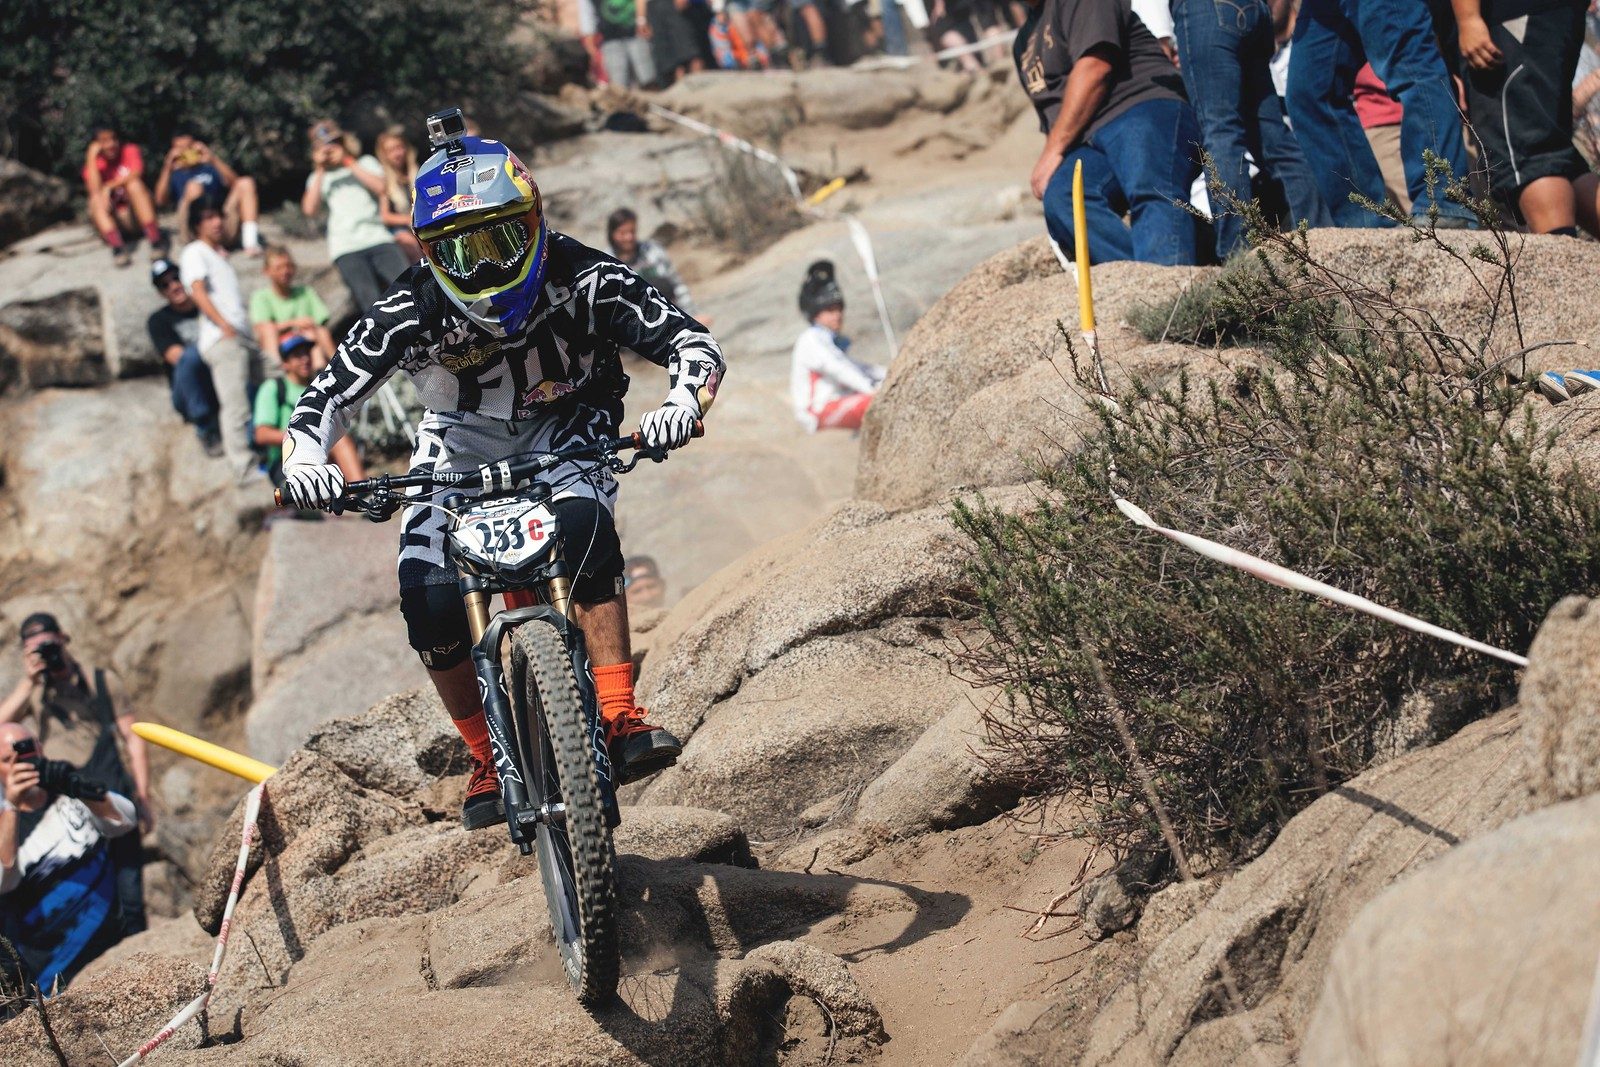 Fontana City National 2014 - GnarHuck - Mountain Biking Pictures - Vital MTB